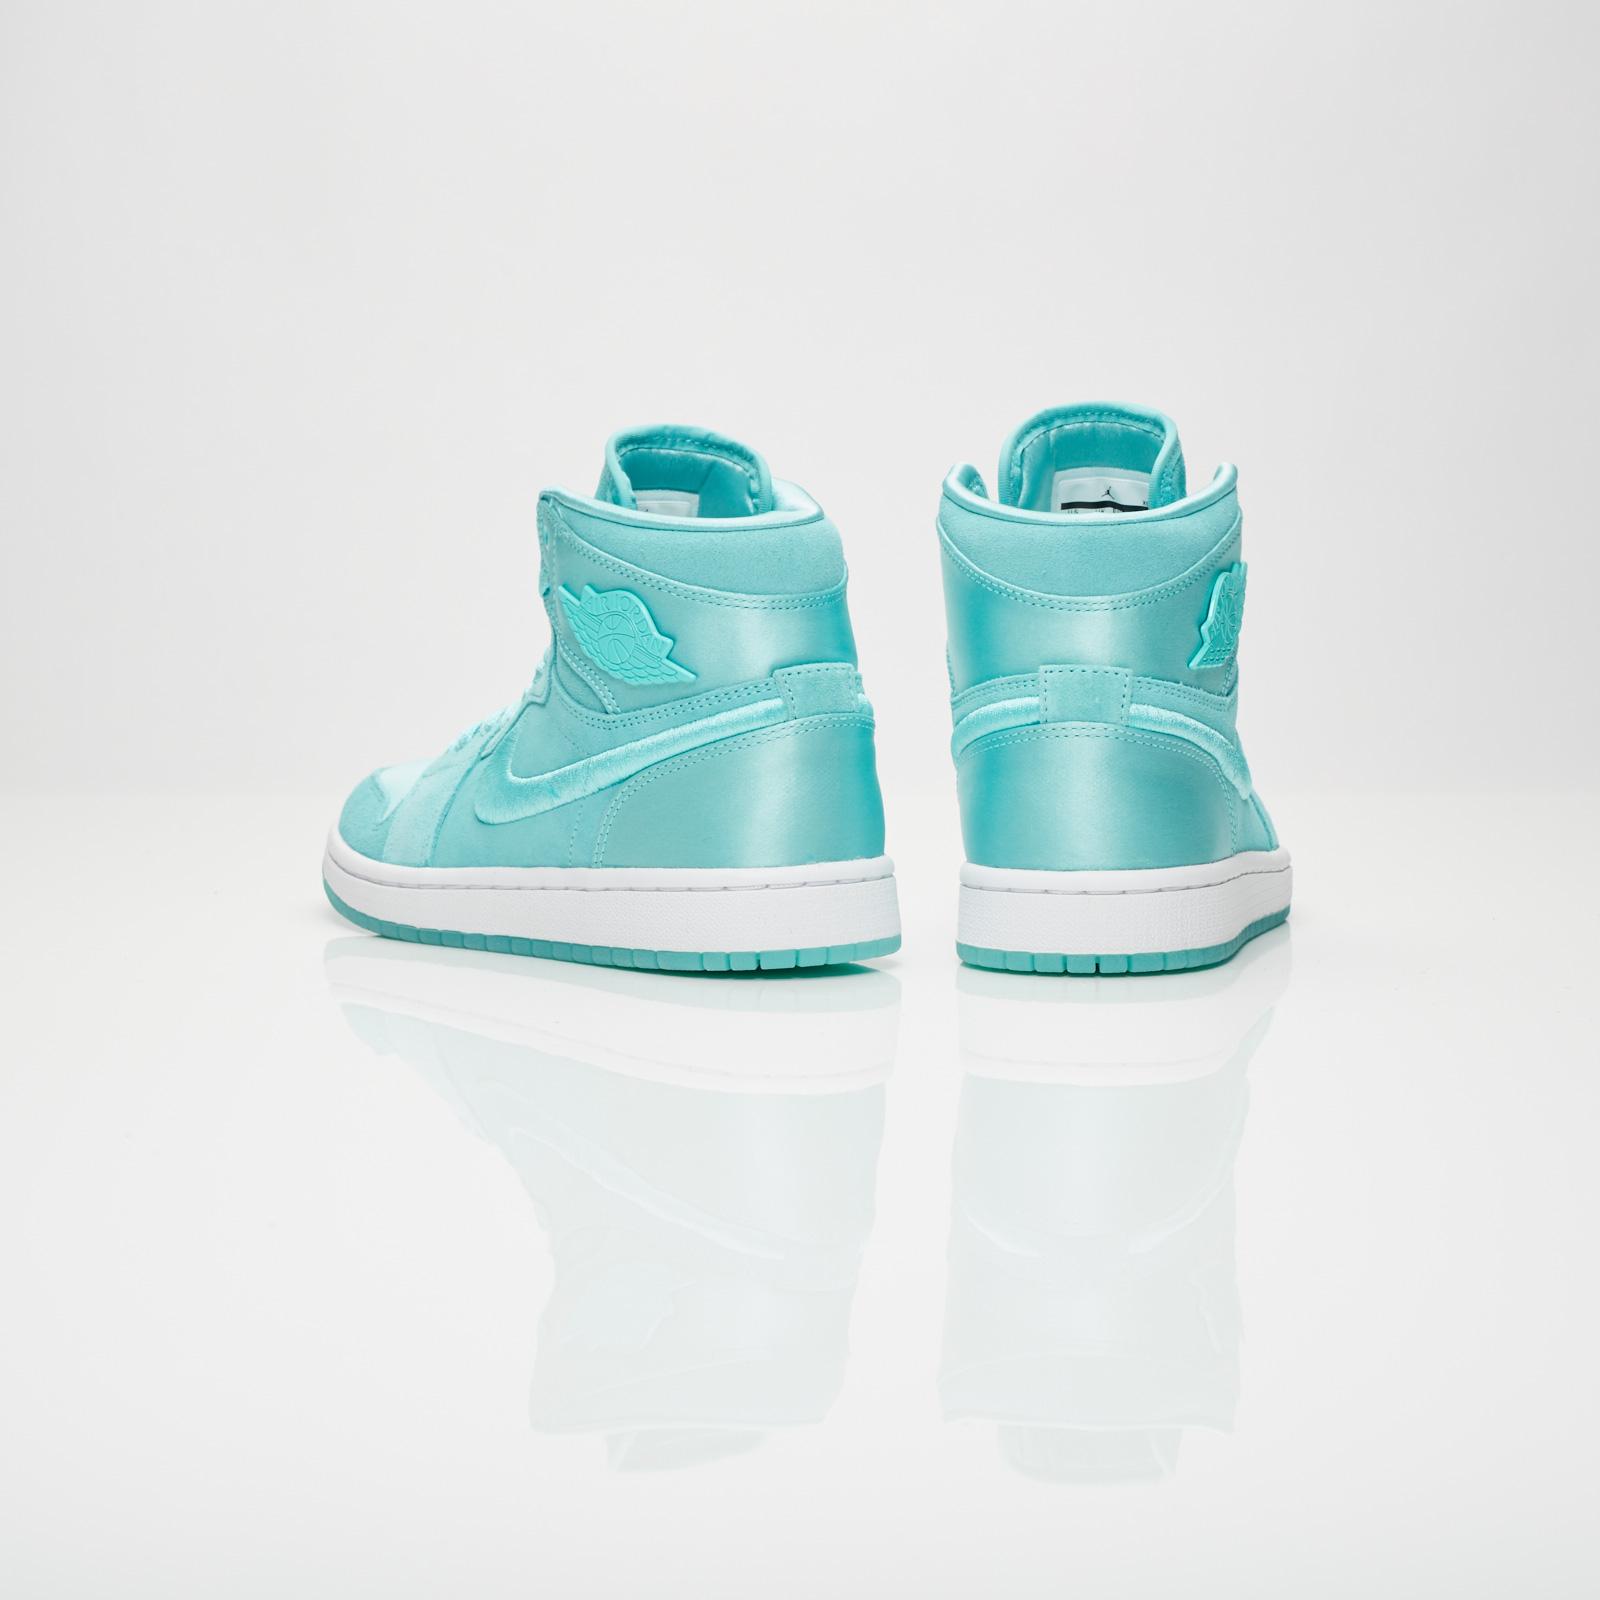 Faial confirmar labios  Jordan Brand Wmns Air Jordan 1 Retro High SOH - Ao1847-440 - Sneakersnstuff  | sneakers & streetwear online since 1999